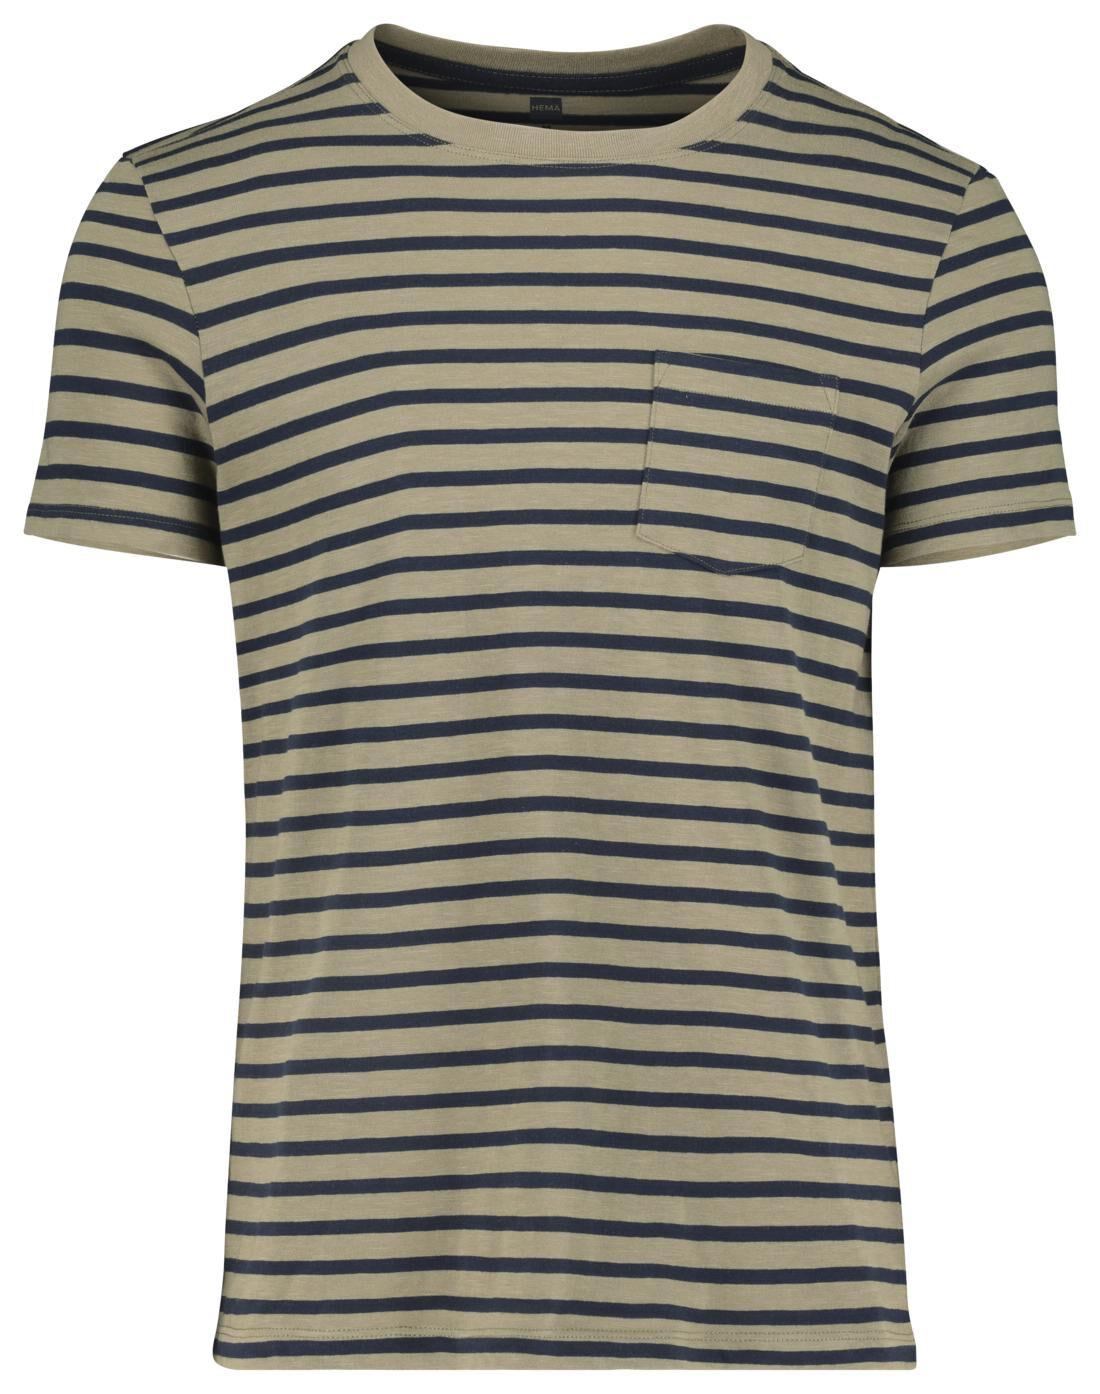 HEMA Heren T-shirt Legergroen (legergroen)